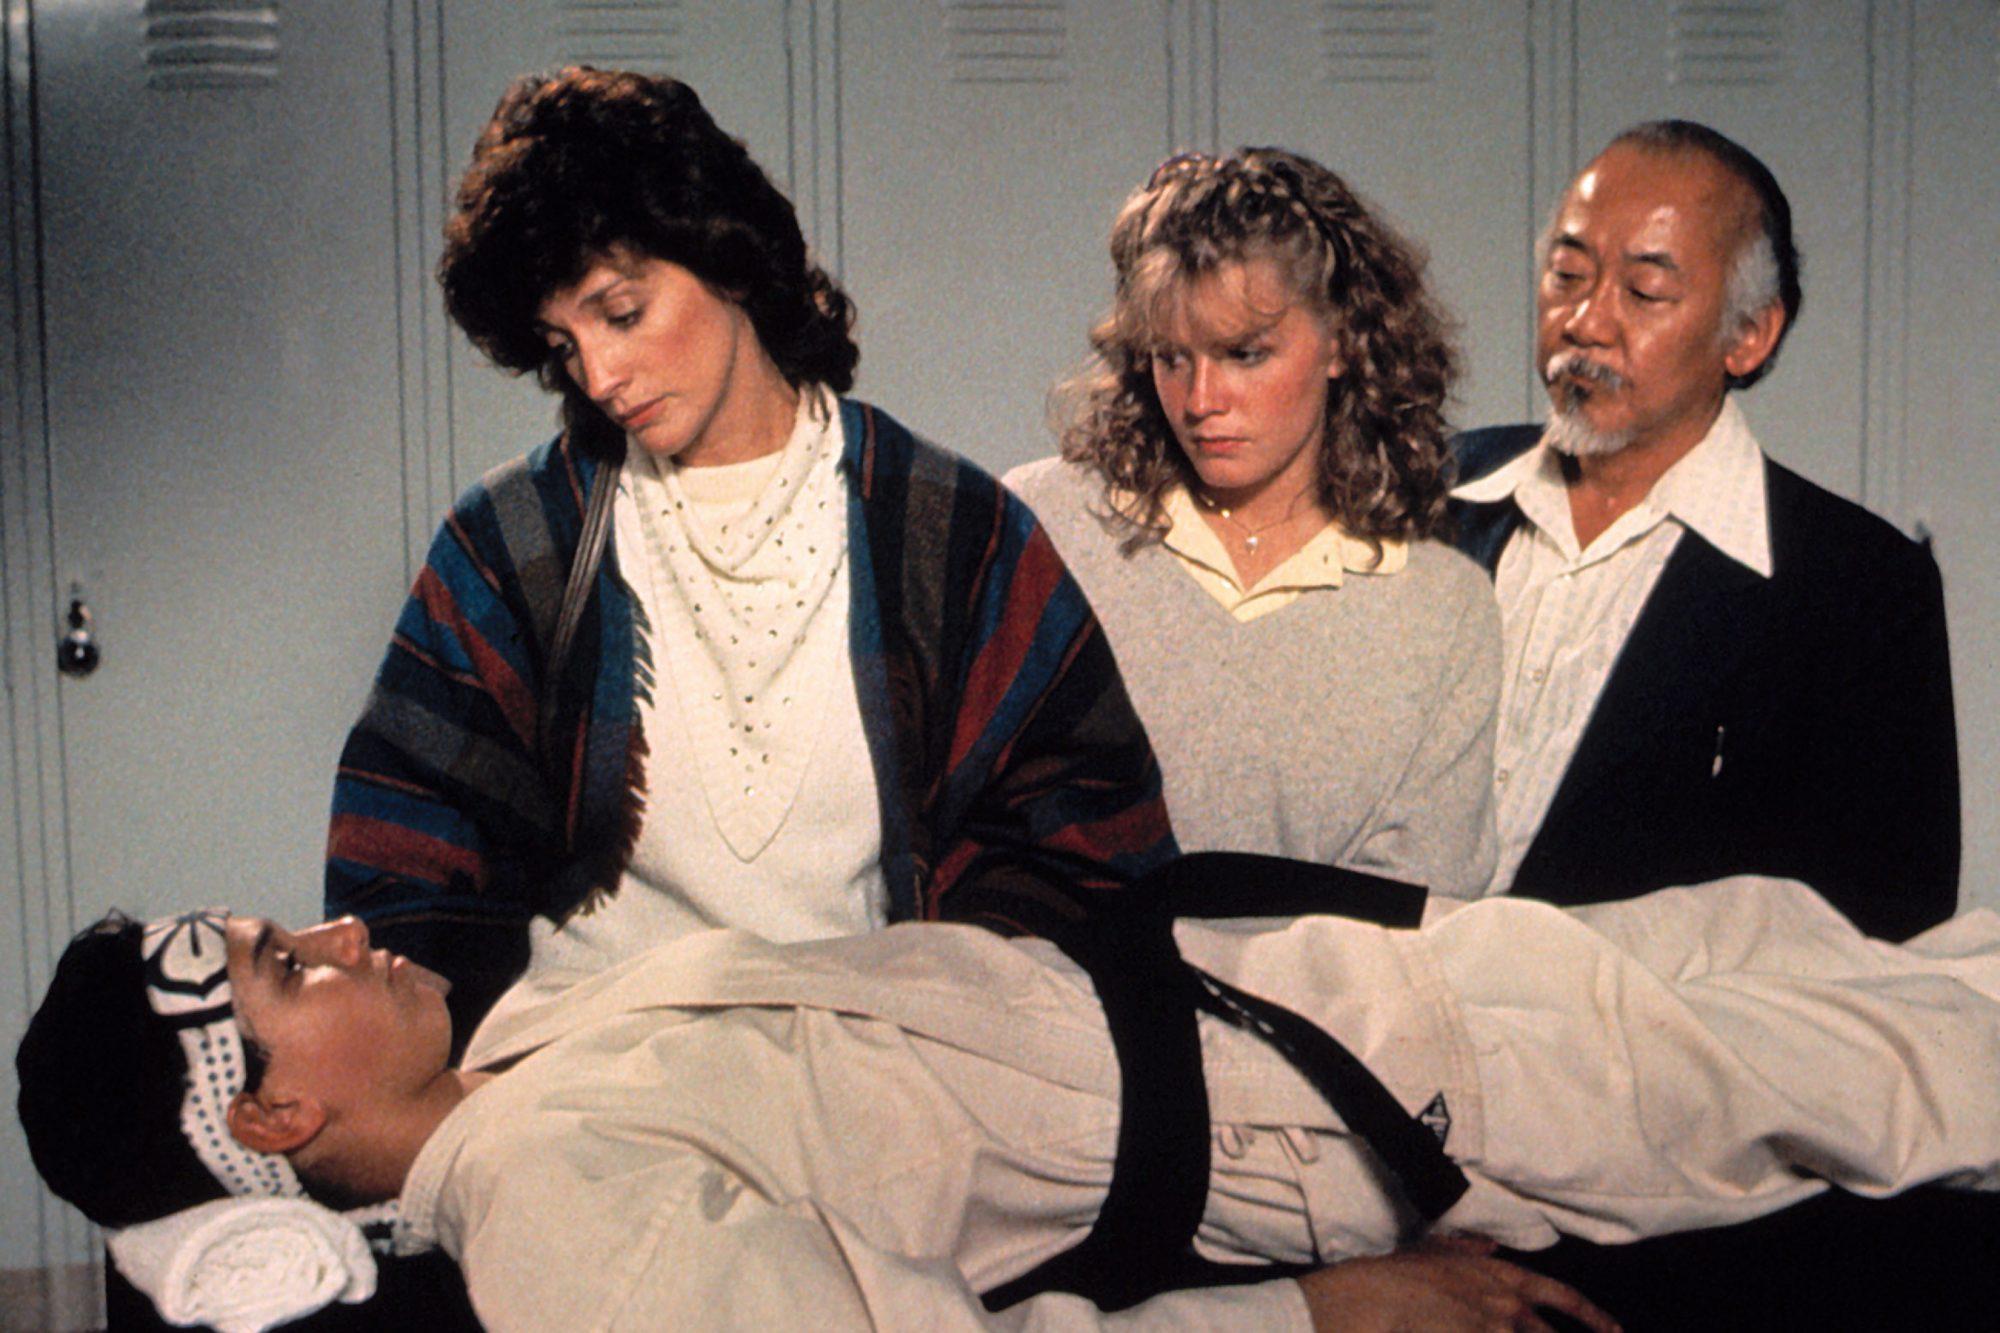 THE KARATE KID, Ralph Macchio, Randee Heller, Elisabeth Shue, Pat Morita, 1984. ©Columbia Pictures/C